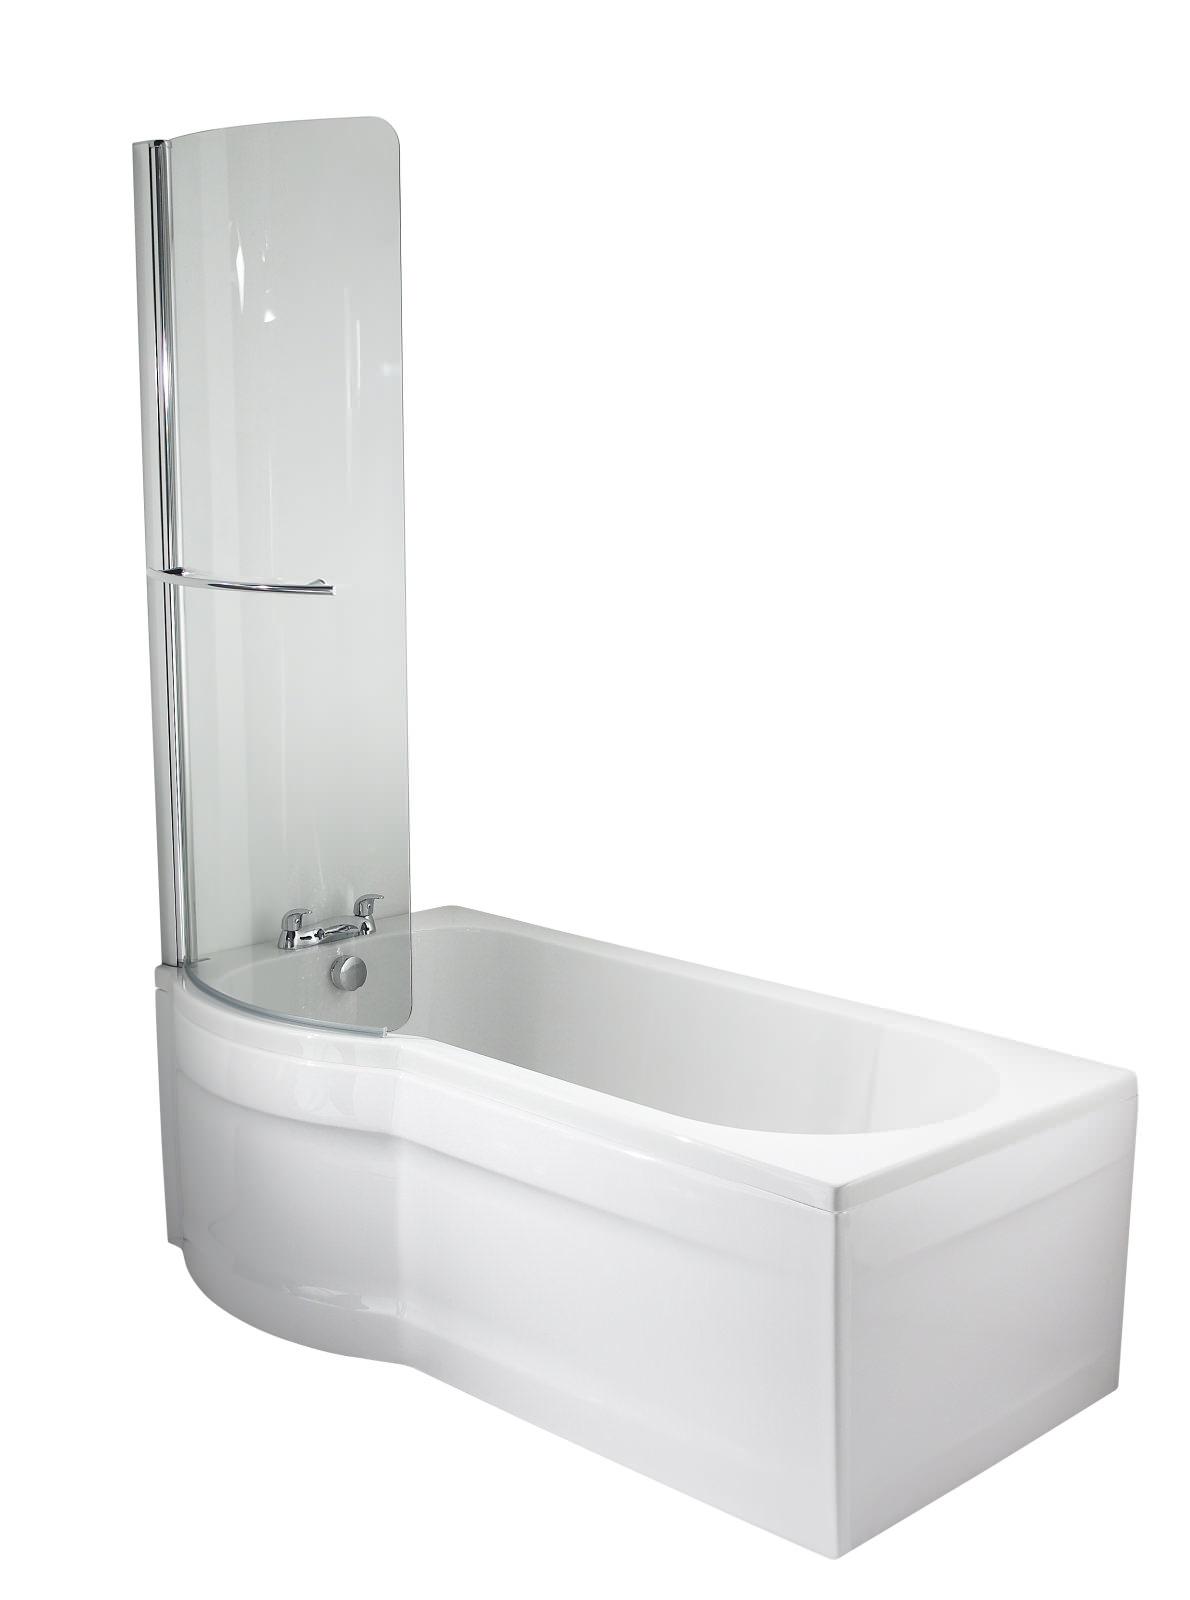 twyford galerie optimise left hand offset shower bath 1500mm munich offset left hand shower bath